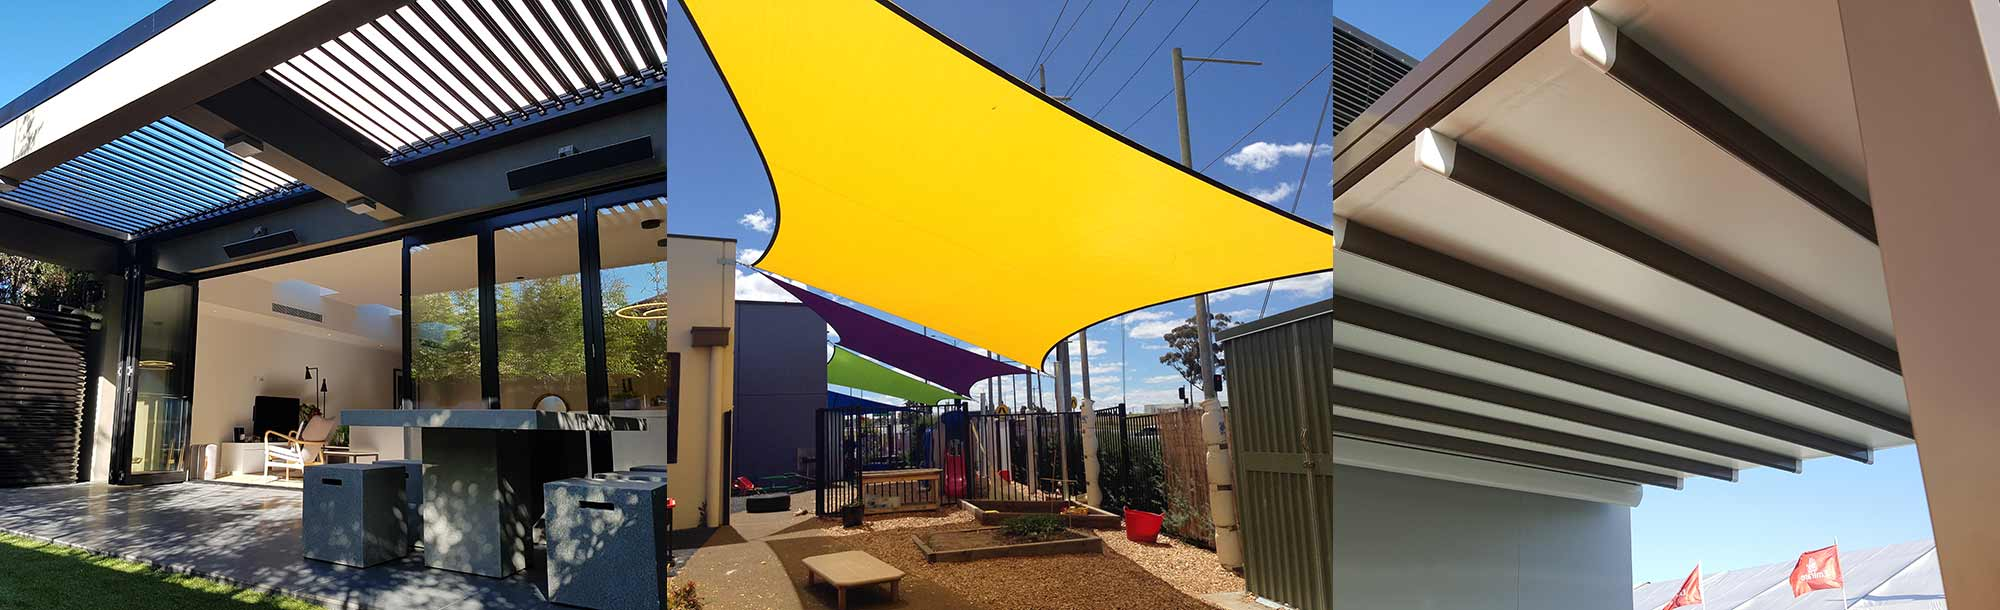 Shade Sails Amp Shade Structures Melbourne Design